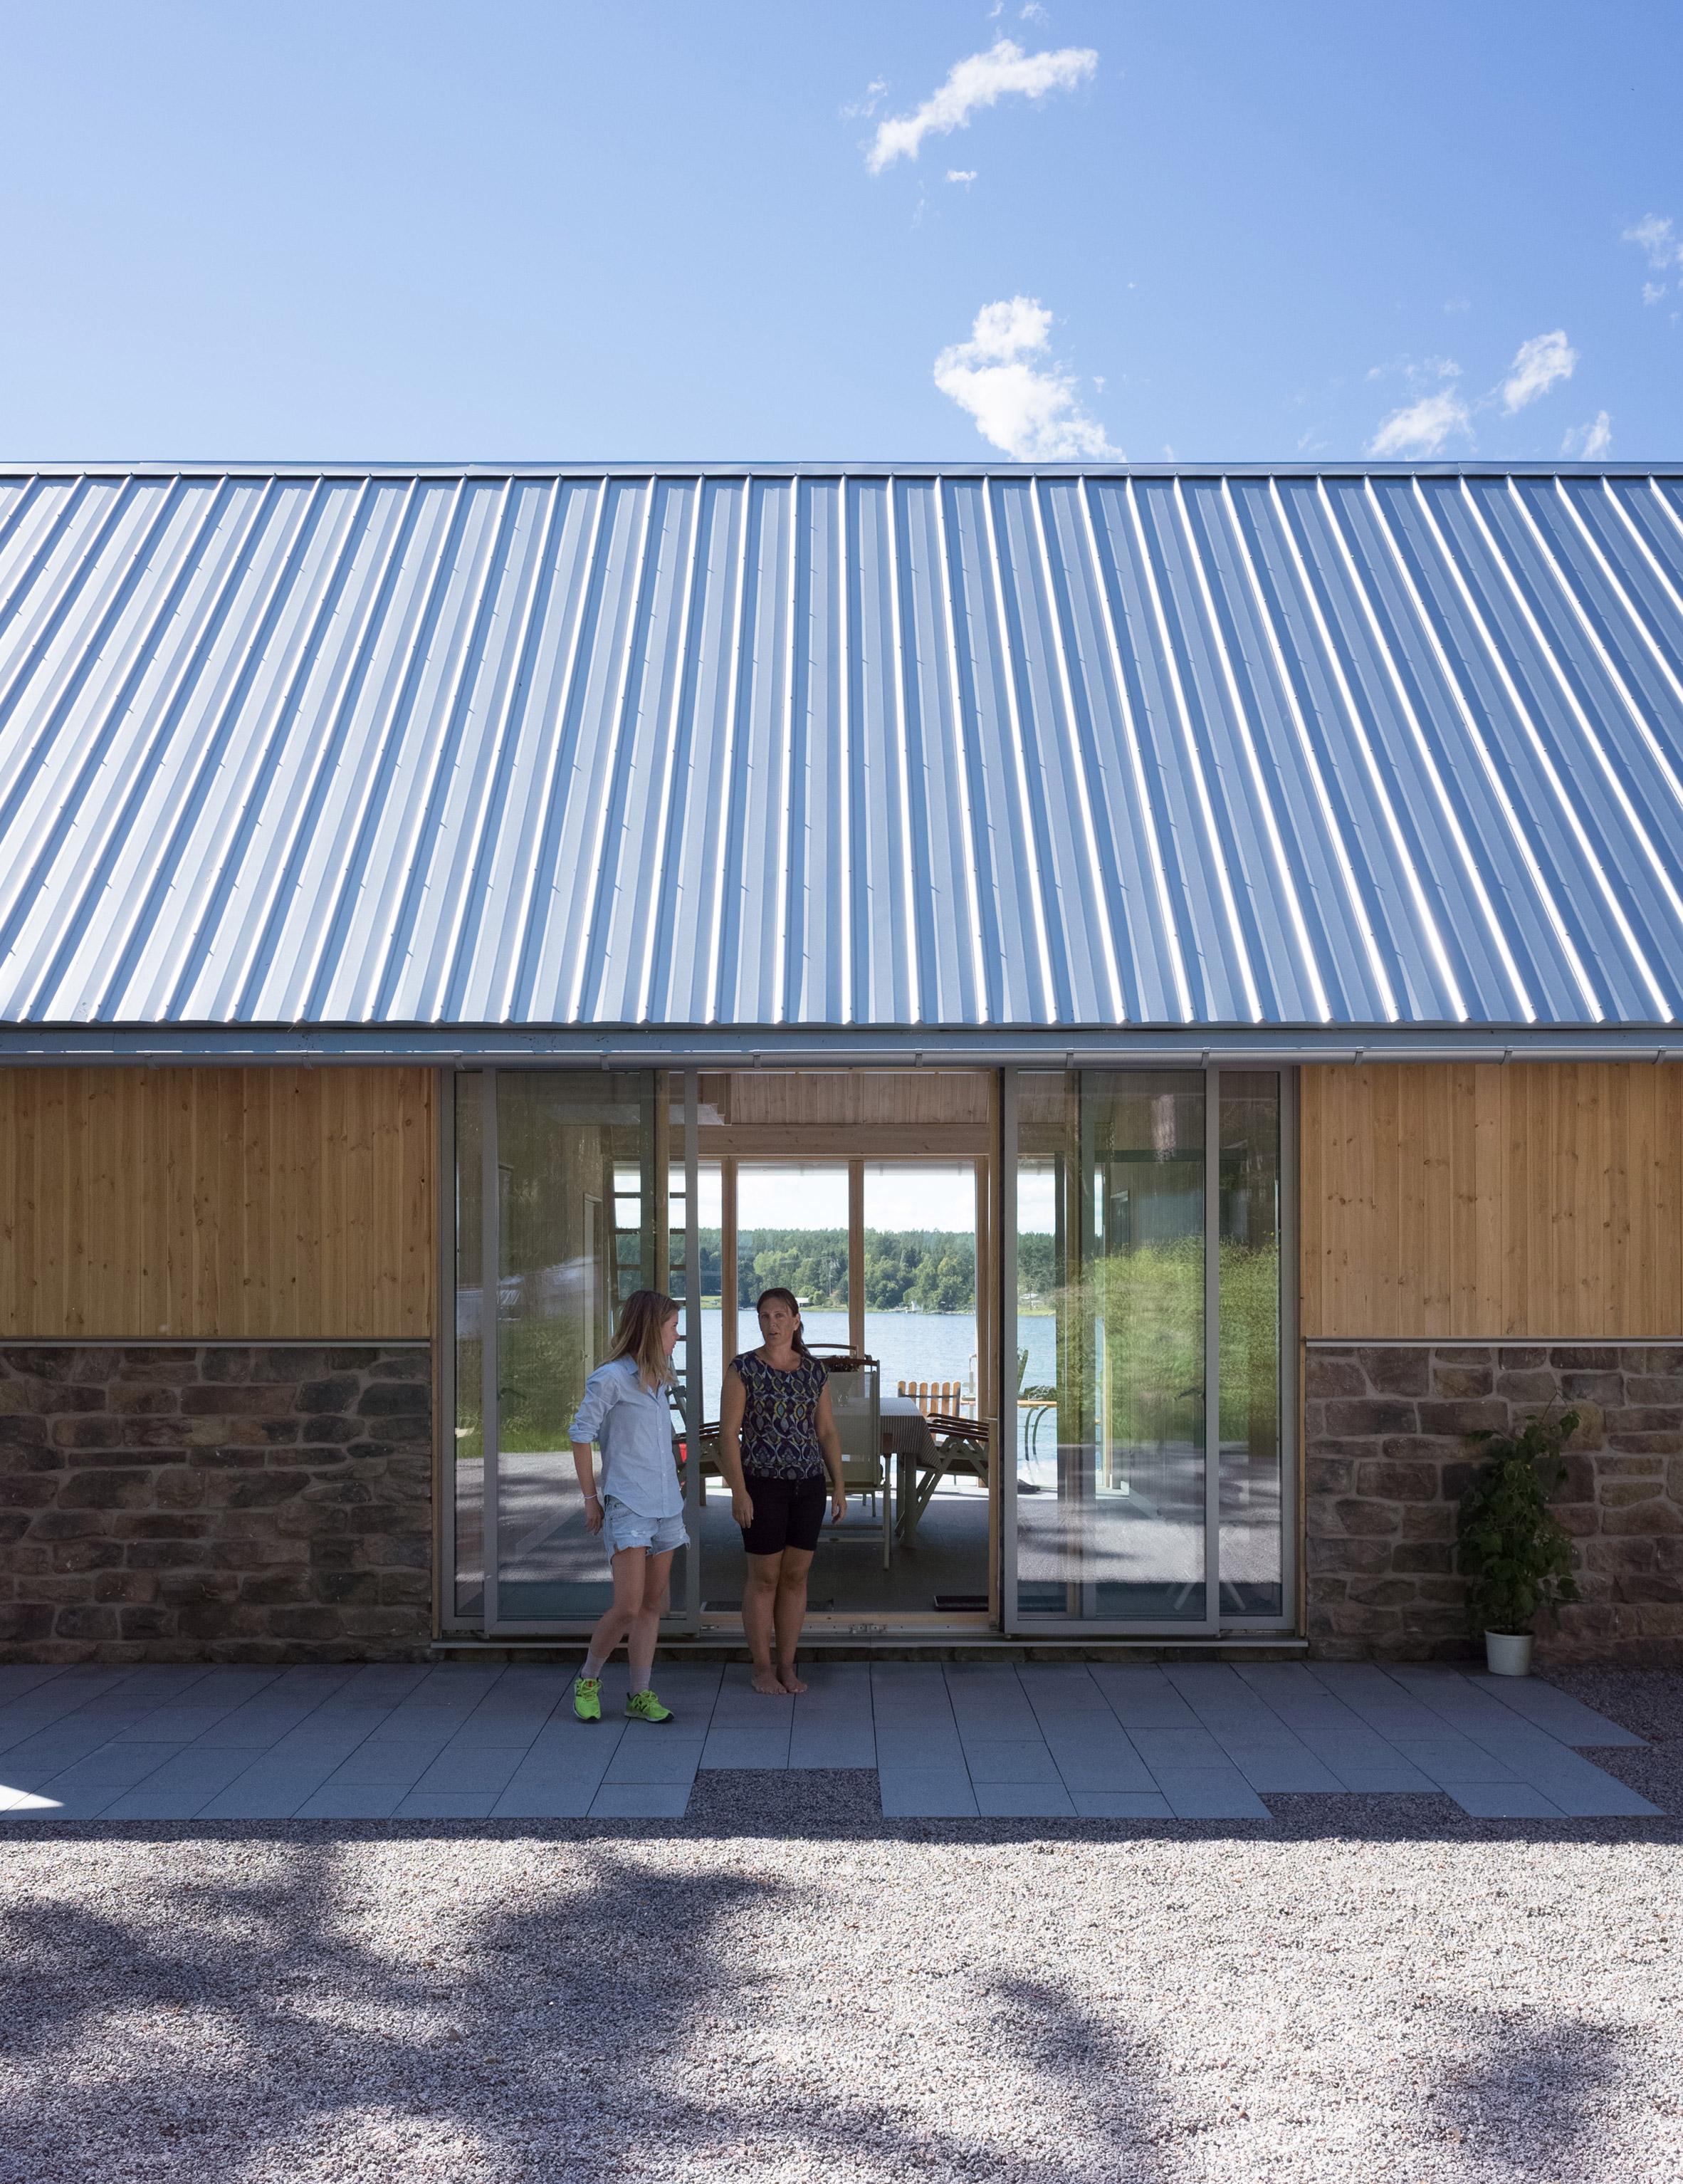 Hus Nilsson by Tina Bergman Architect